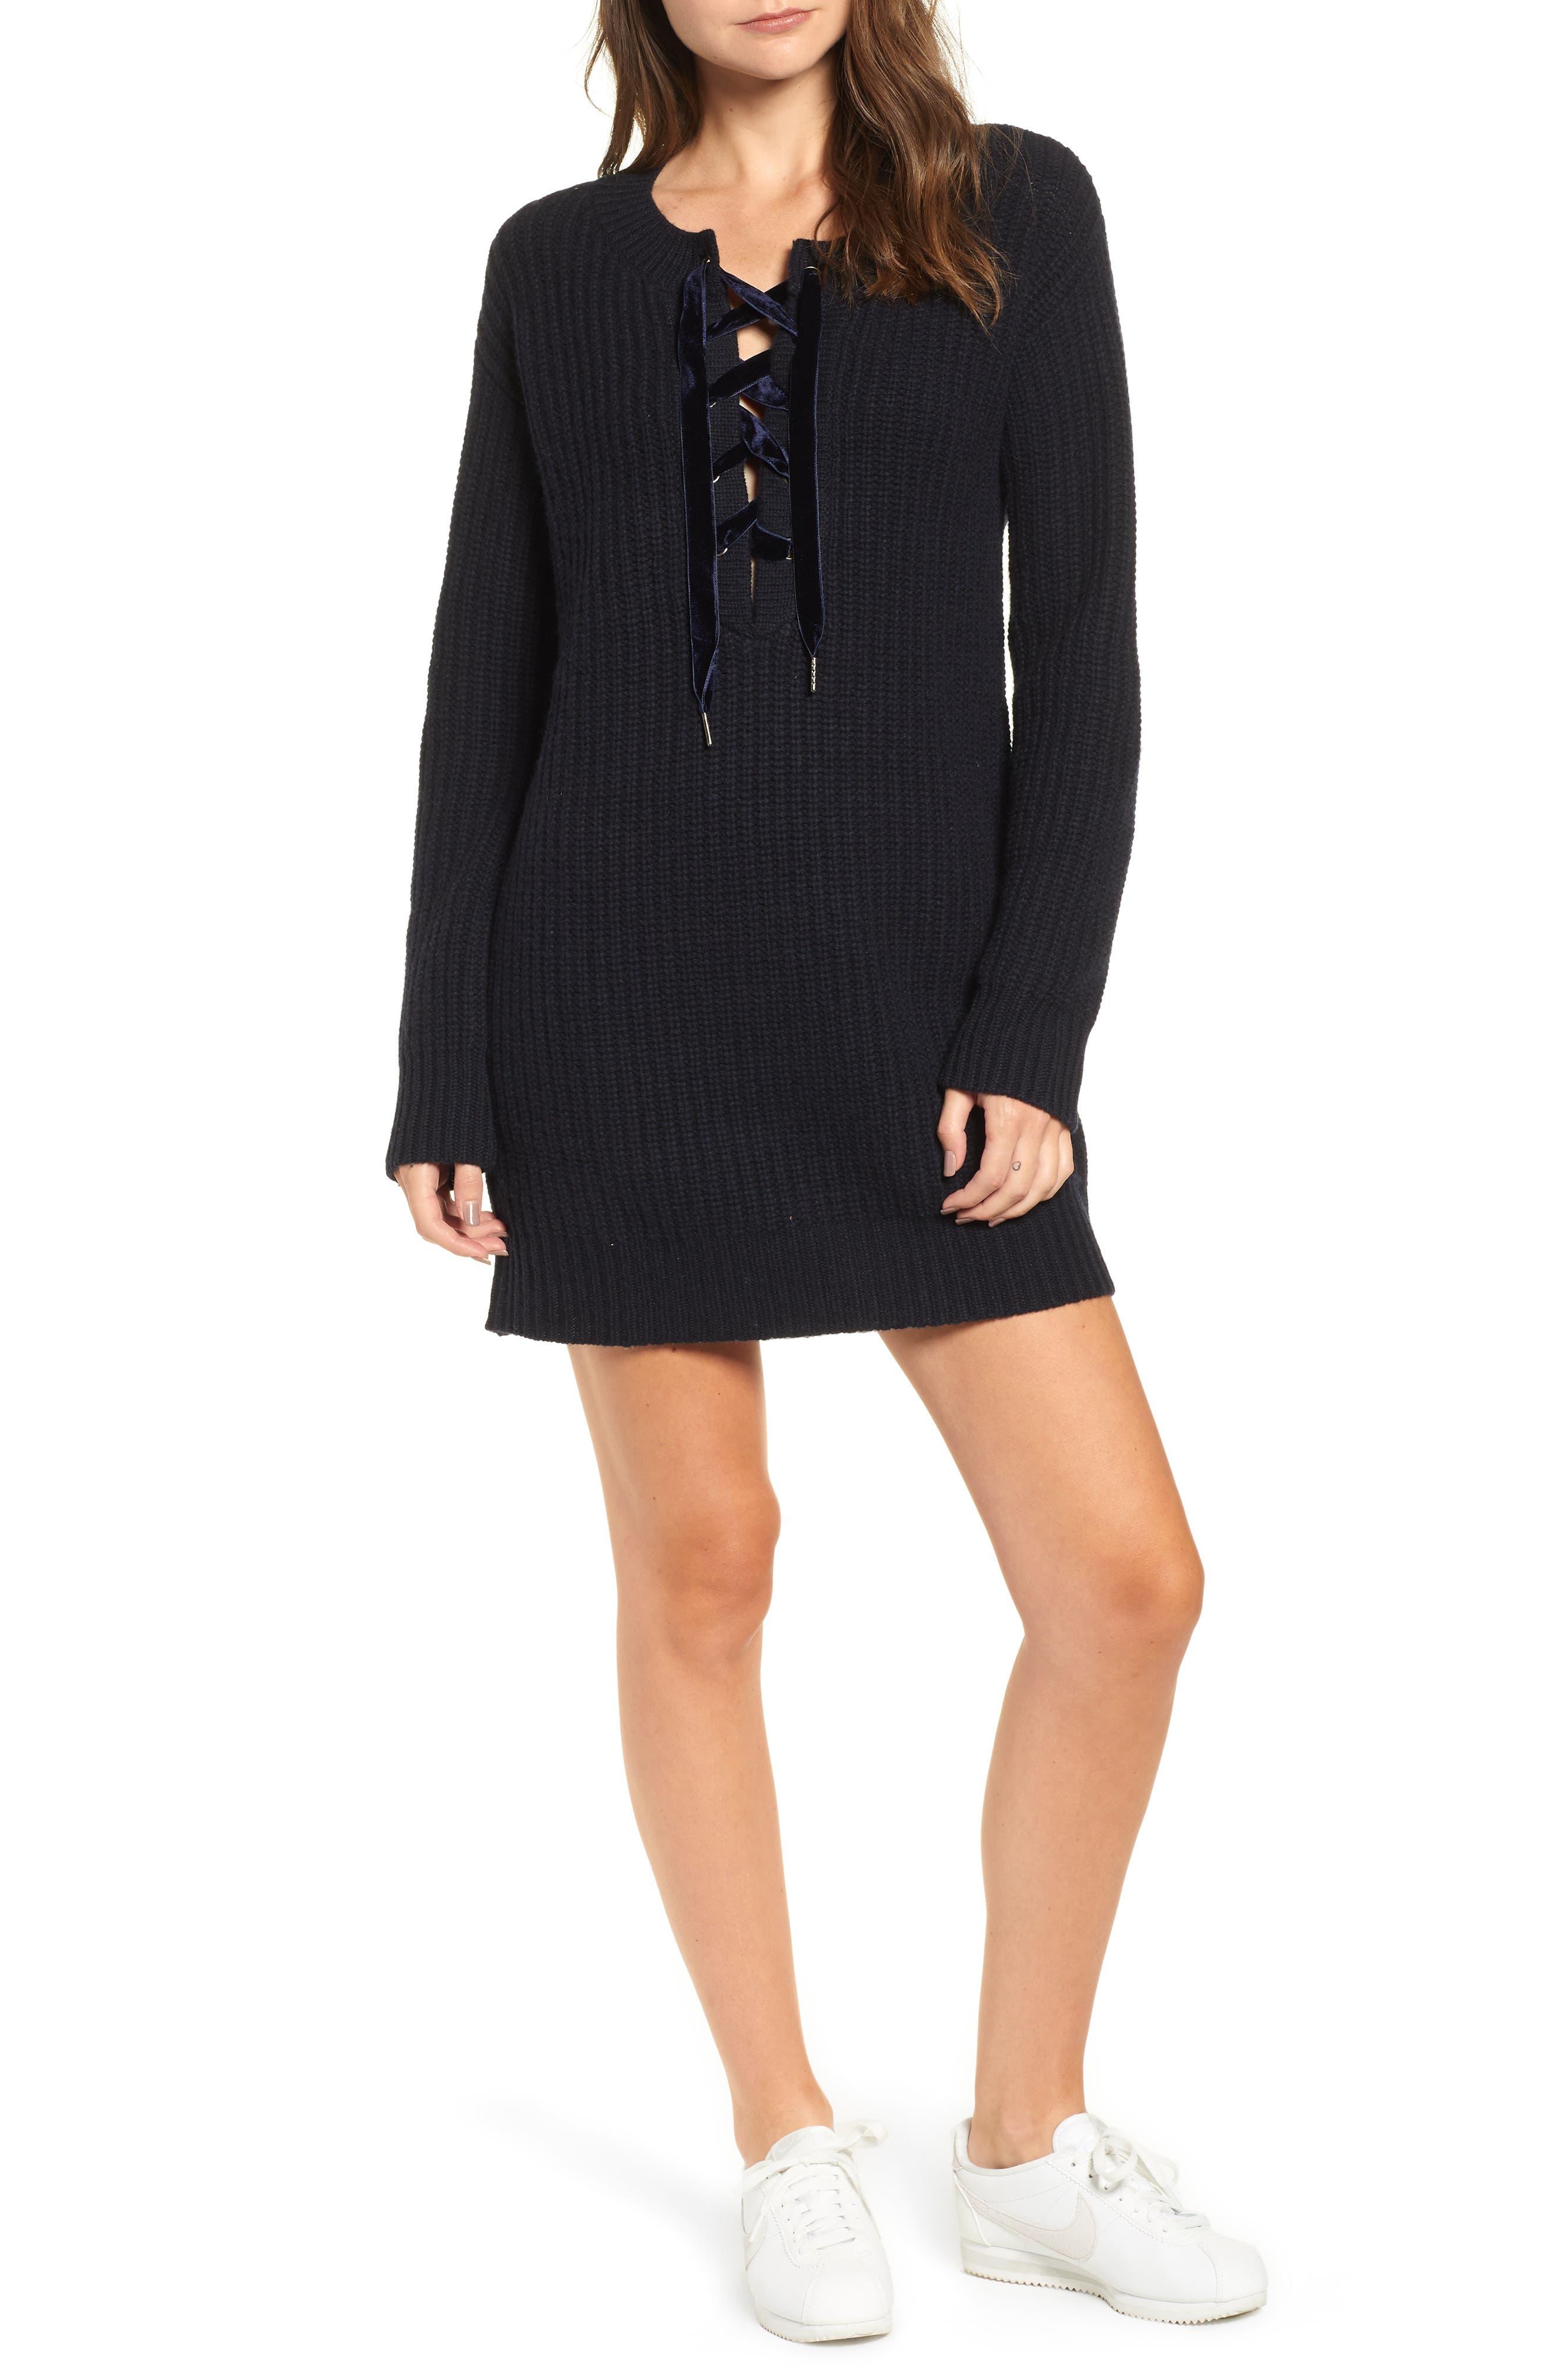 Nicole Velvet Tie Sweater Dress,                         Main,                         color, 400